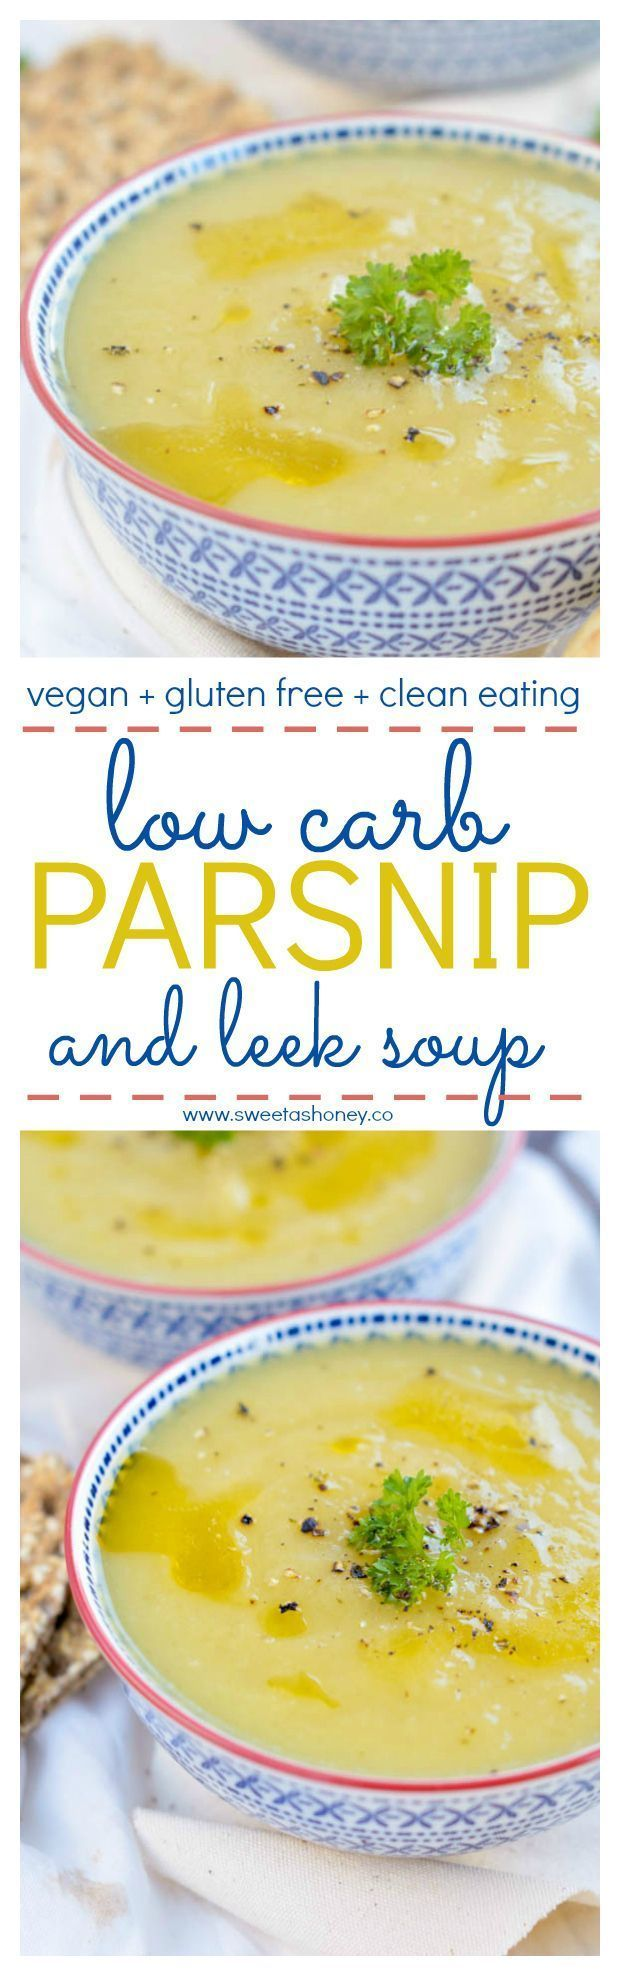 Leek Parsnip Soup recipe. Low Carb, Vegan, Gluten free. Easy detox soup. Low calorie. Skinny. Weight loss soup.